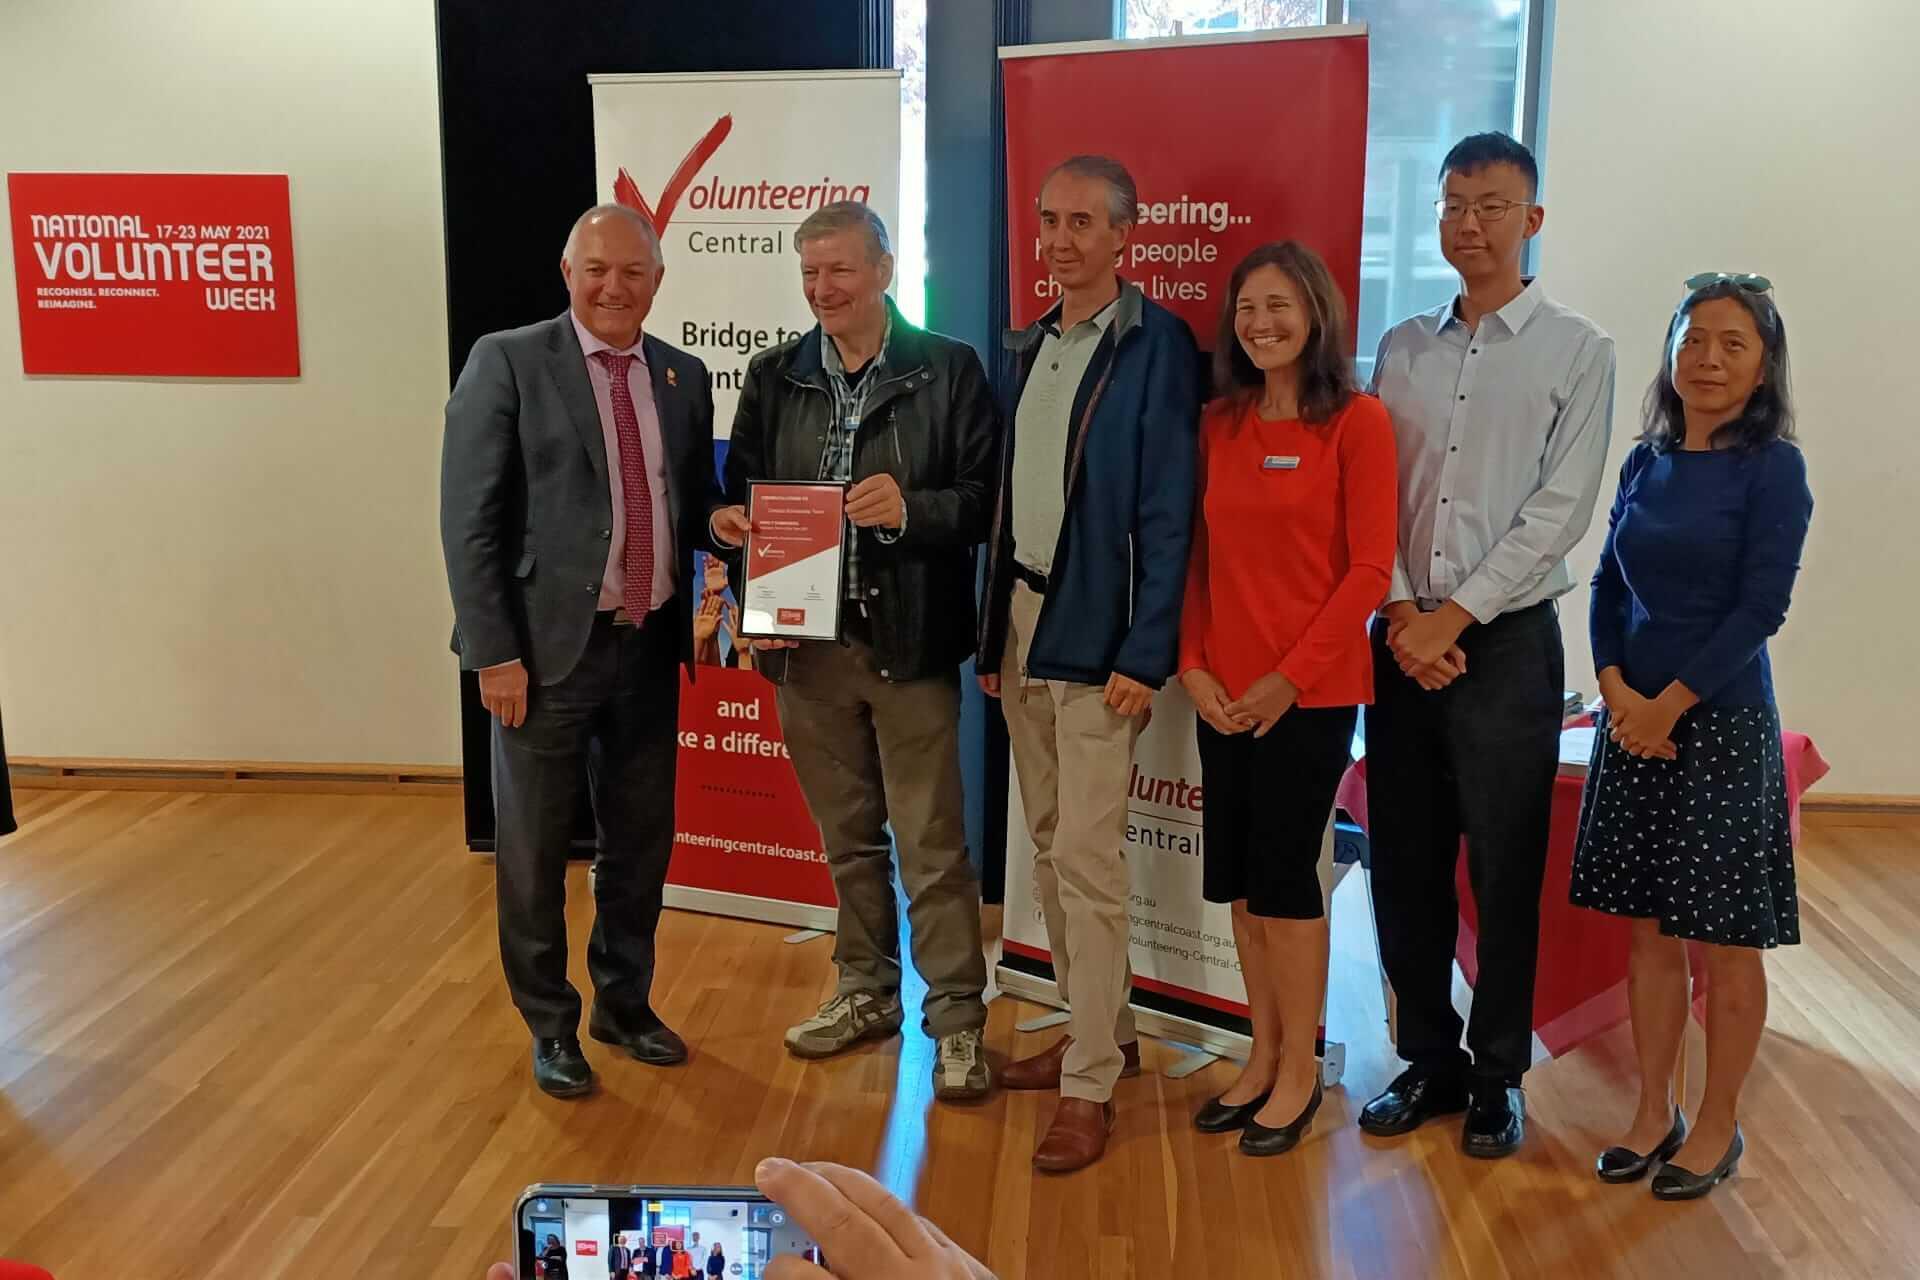 Crestani volunteers receives their award from David Harris